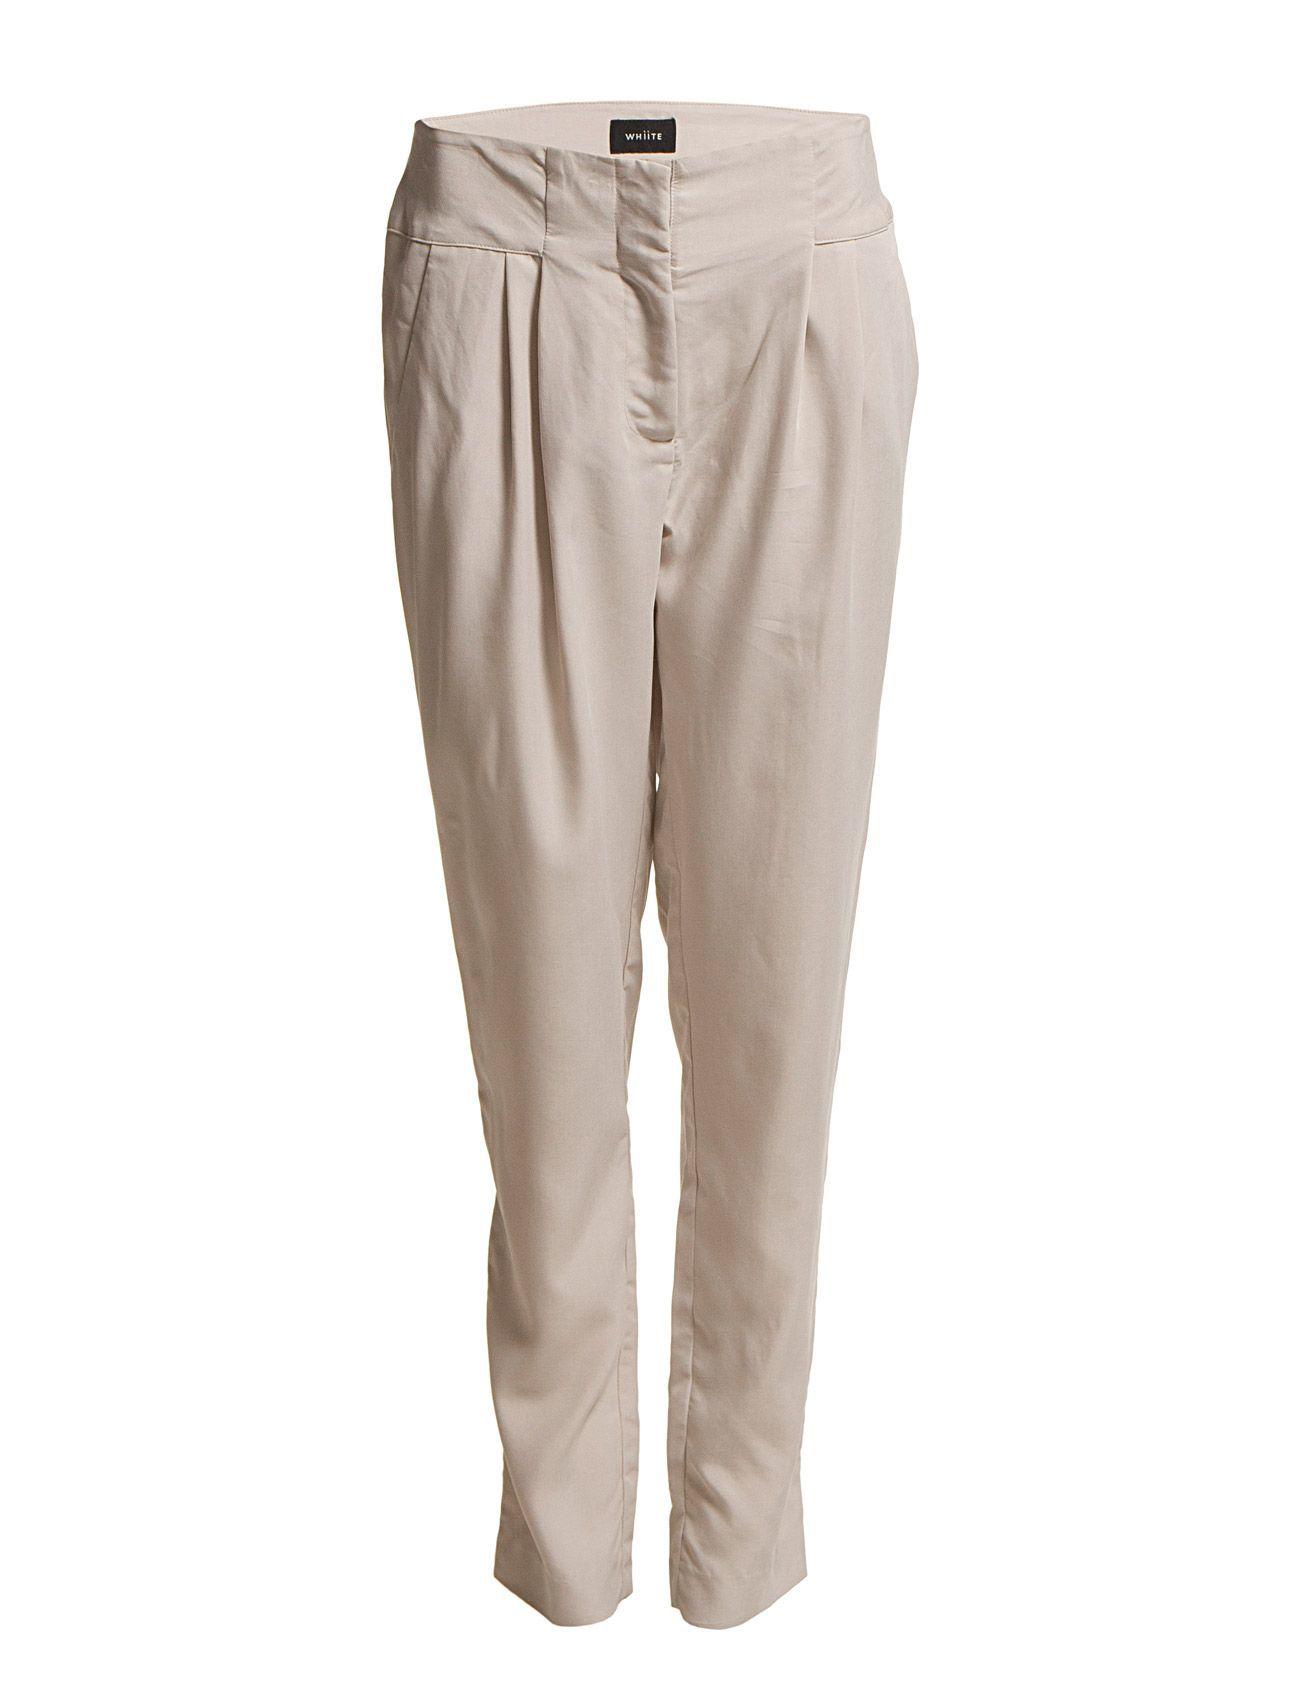 Genny Pants